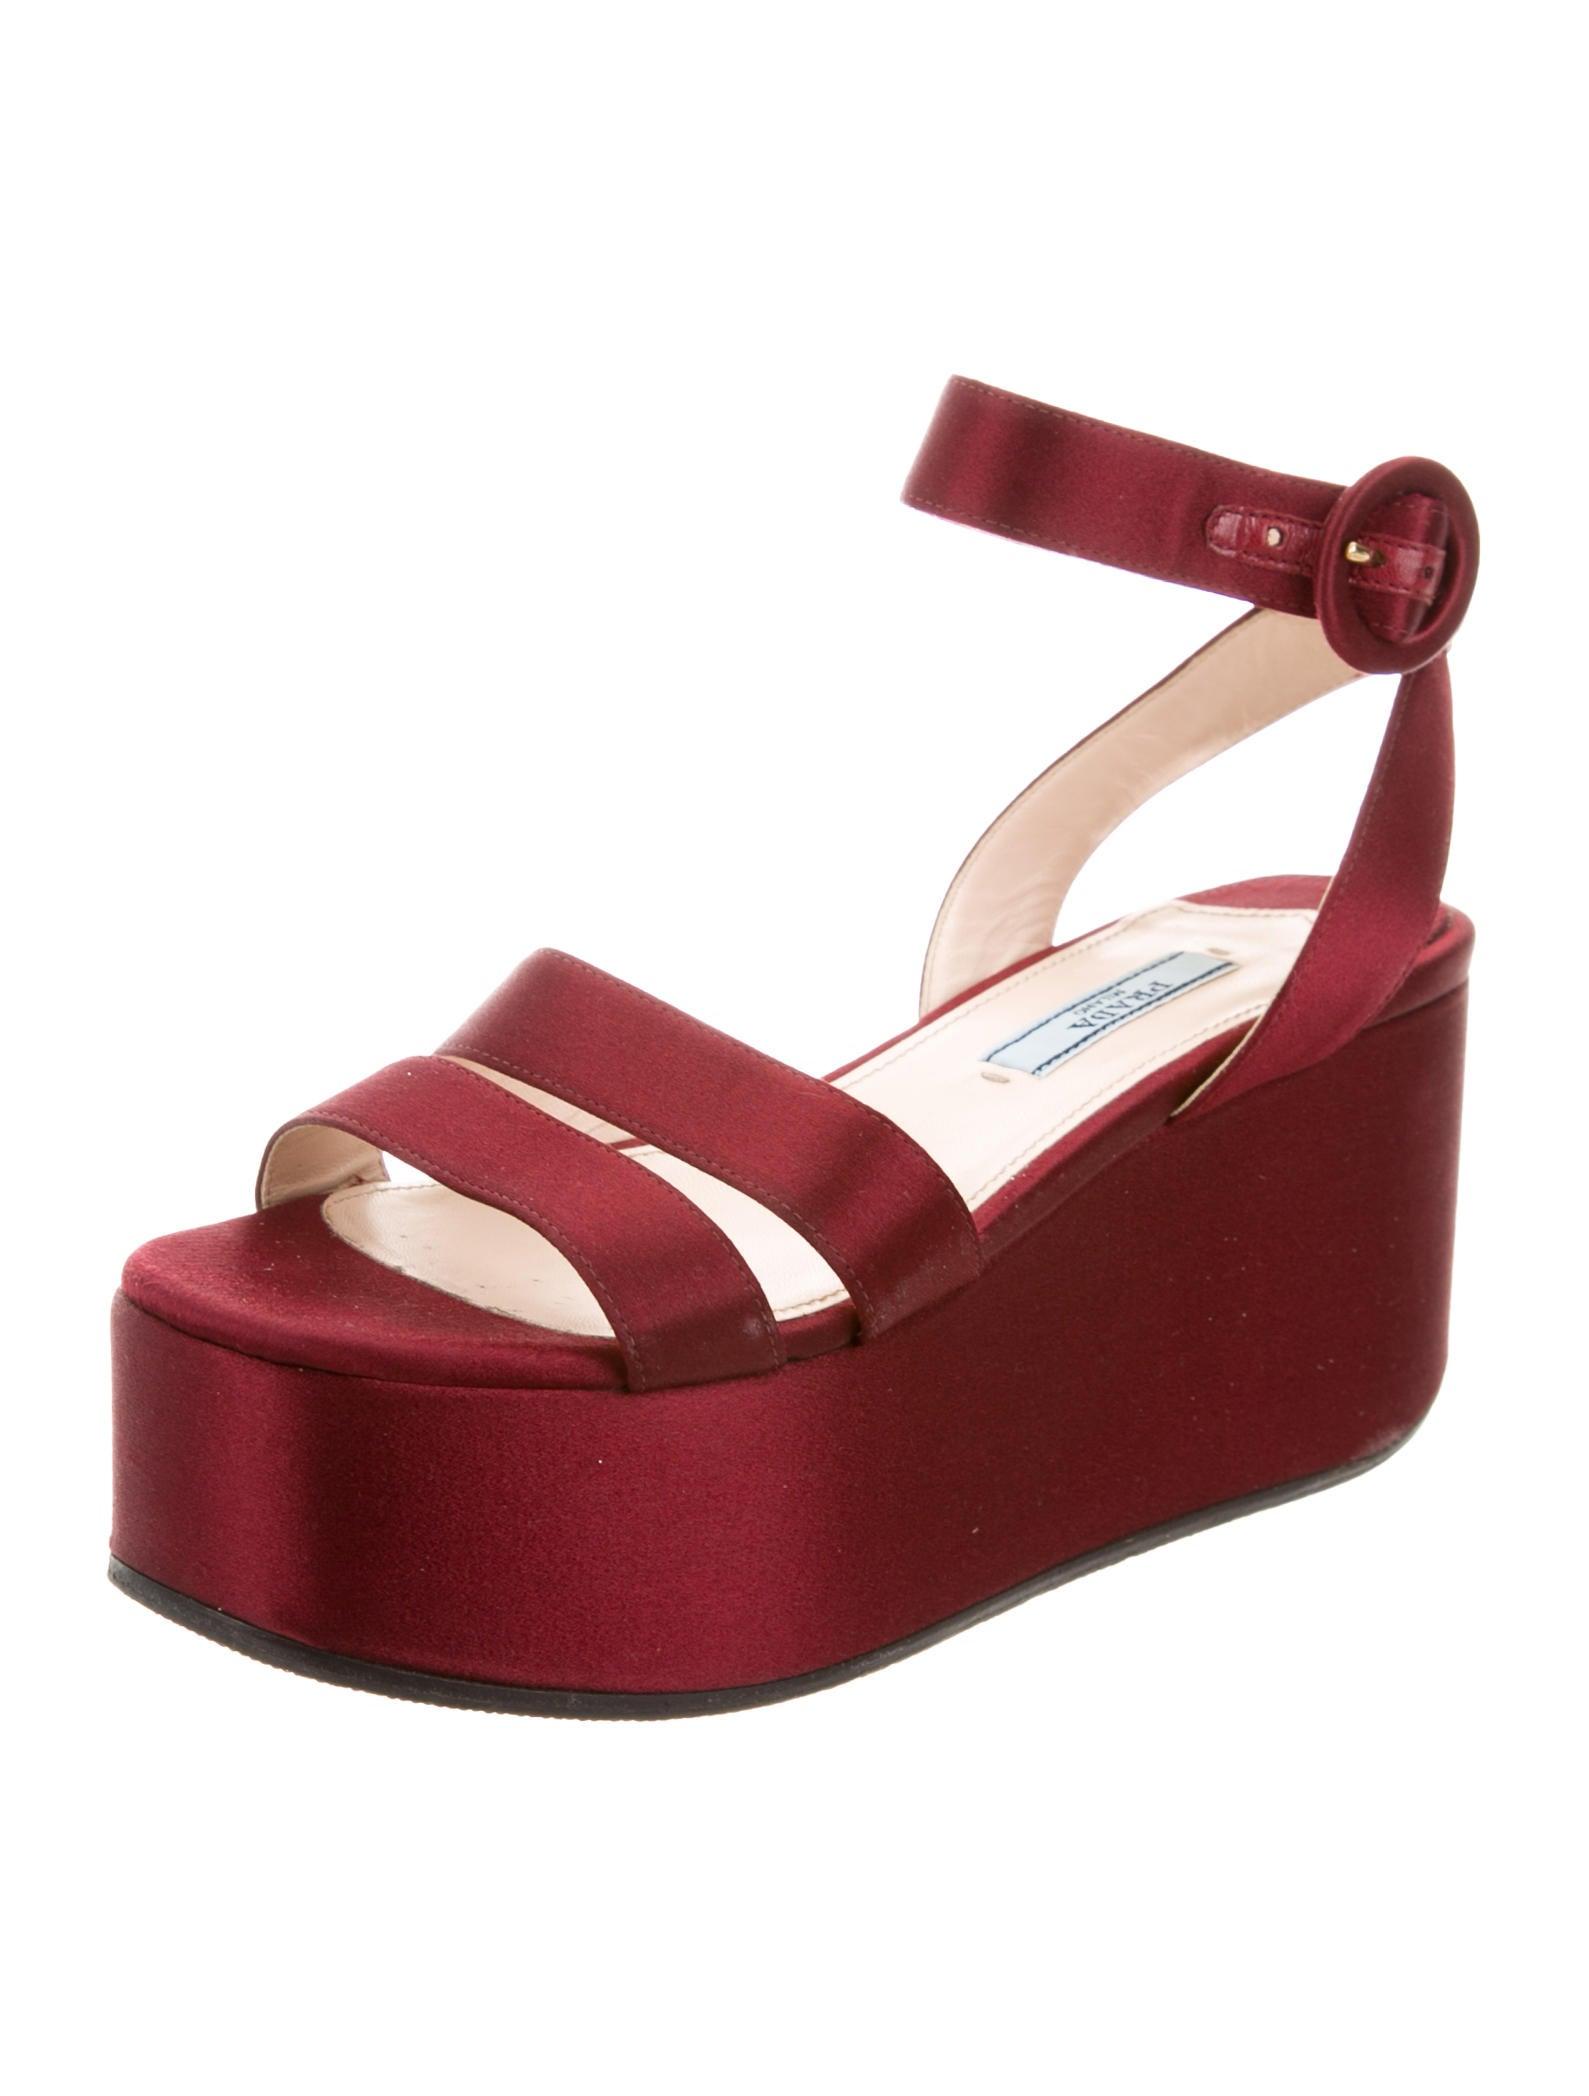 prada satin platform wedge sandals shoes pra164976